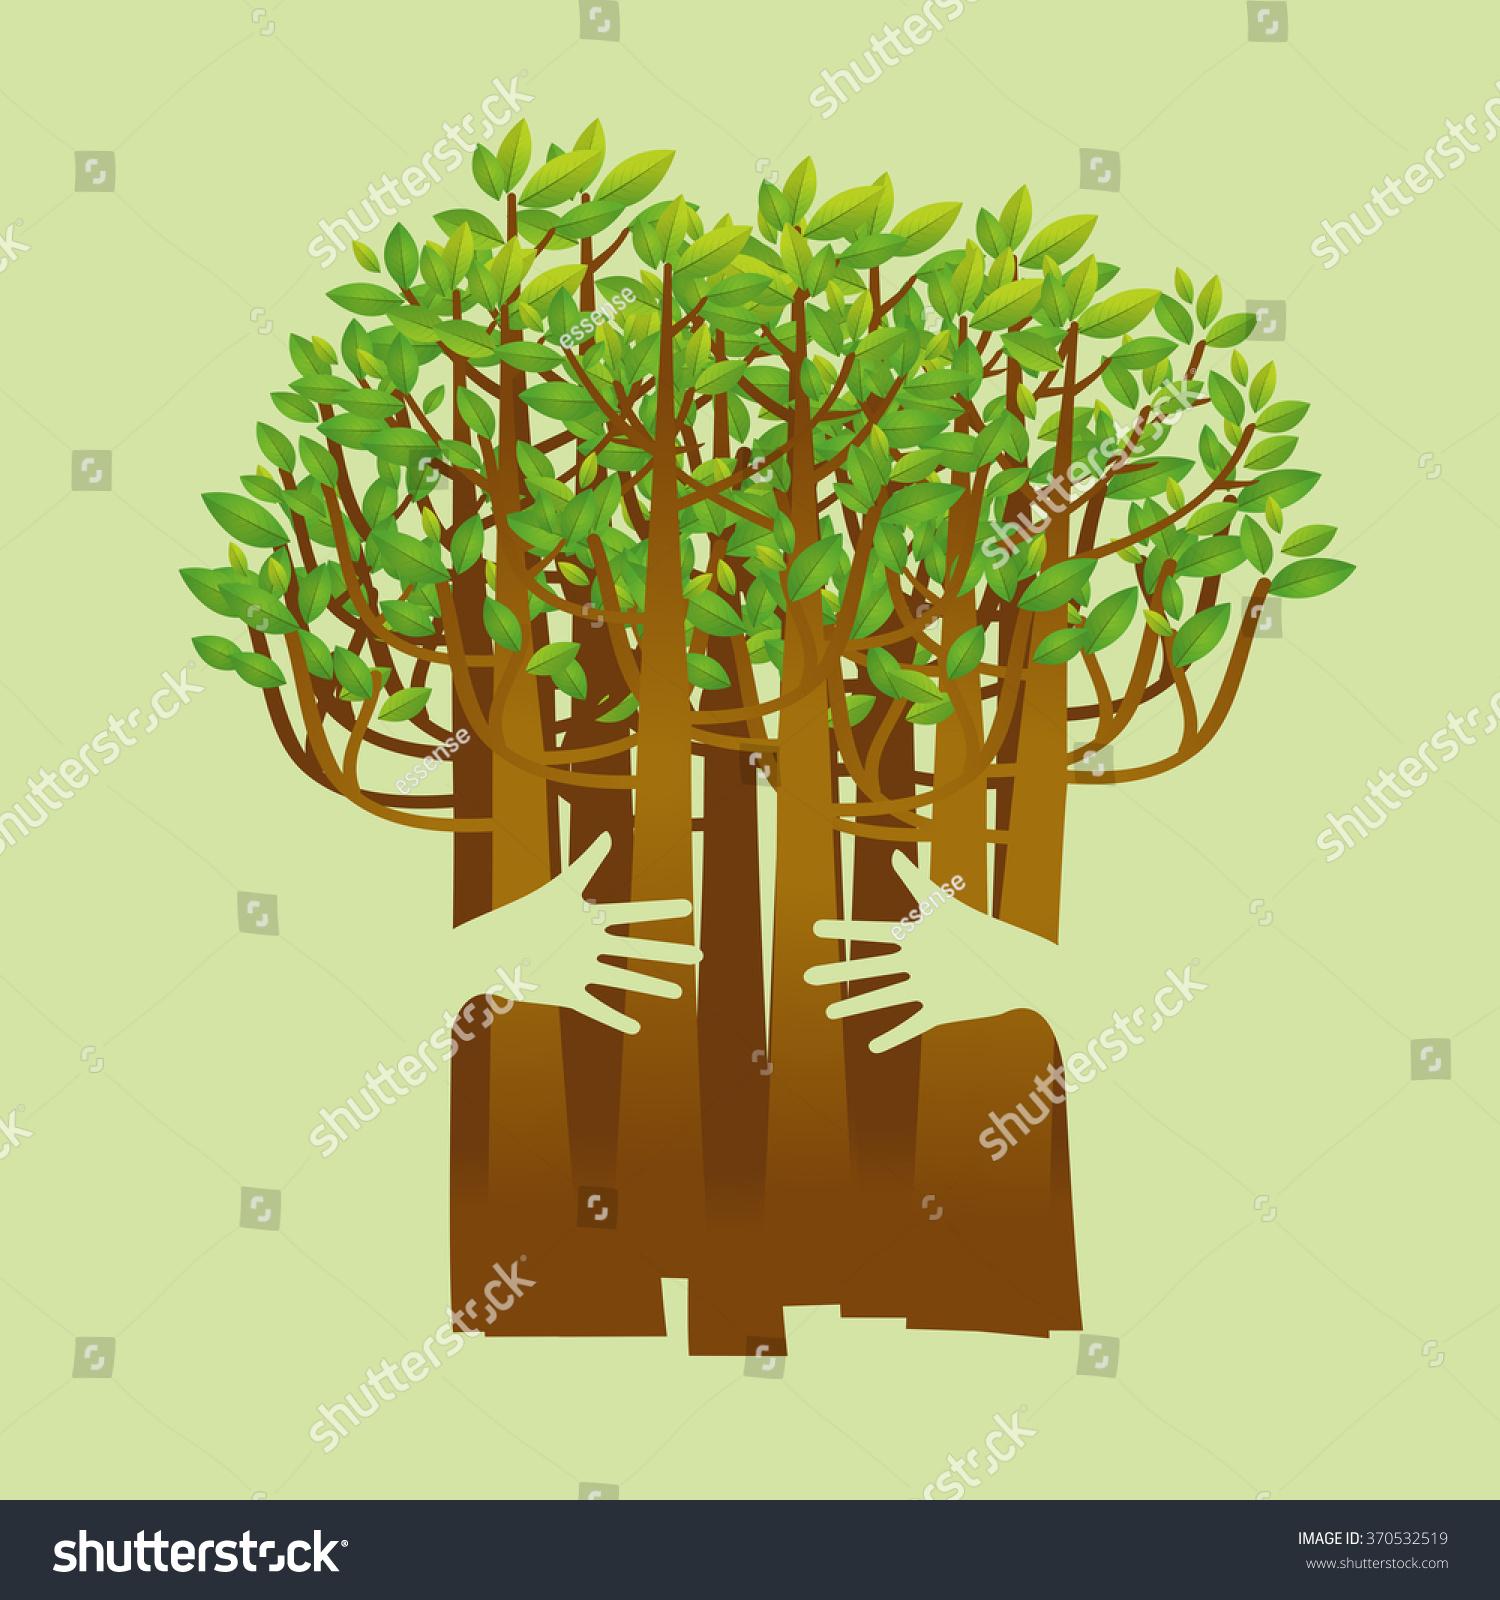 Environmental Concept Earthfriendly Landscapes: Eco Friendly Hands Hug Concept Green Stock Vector